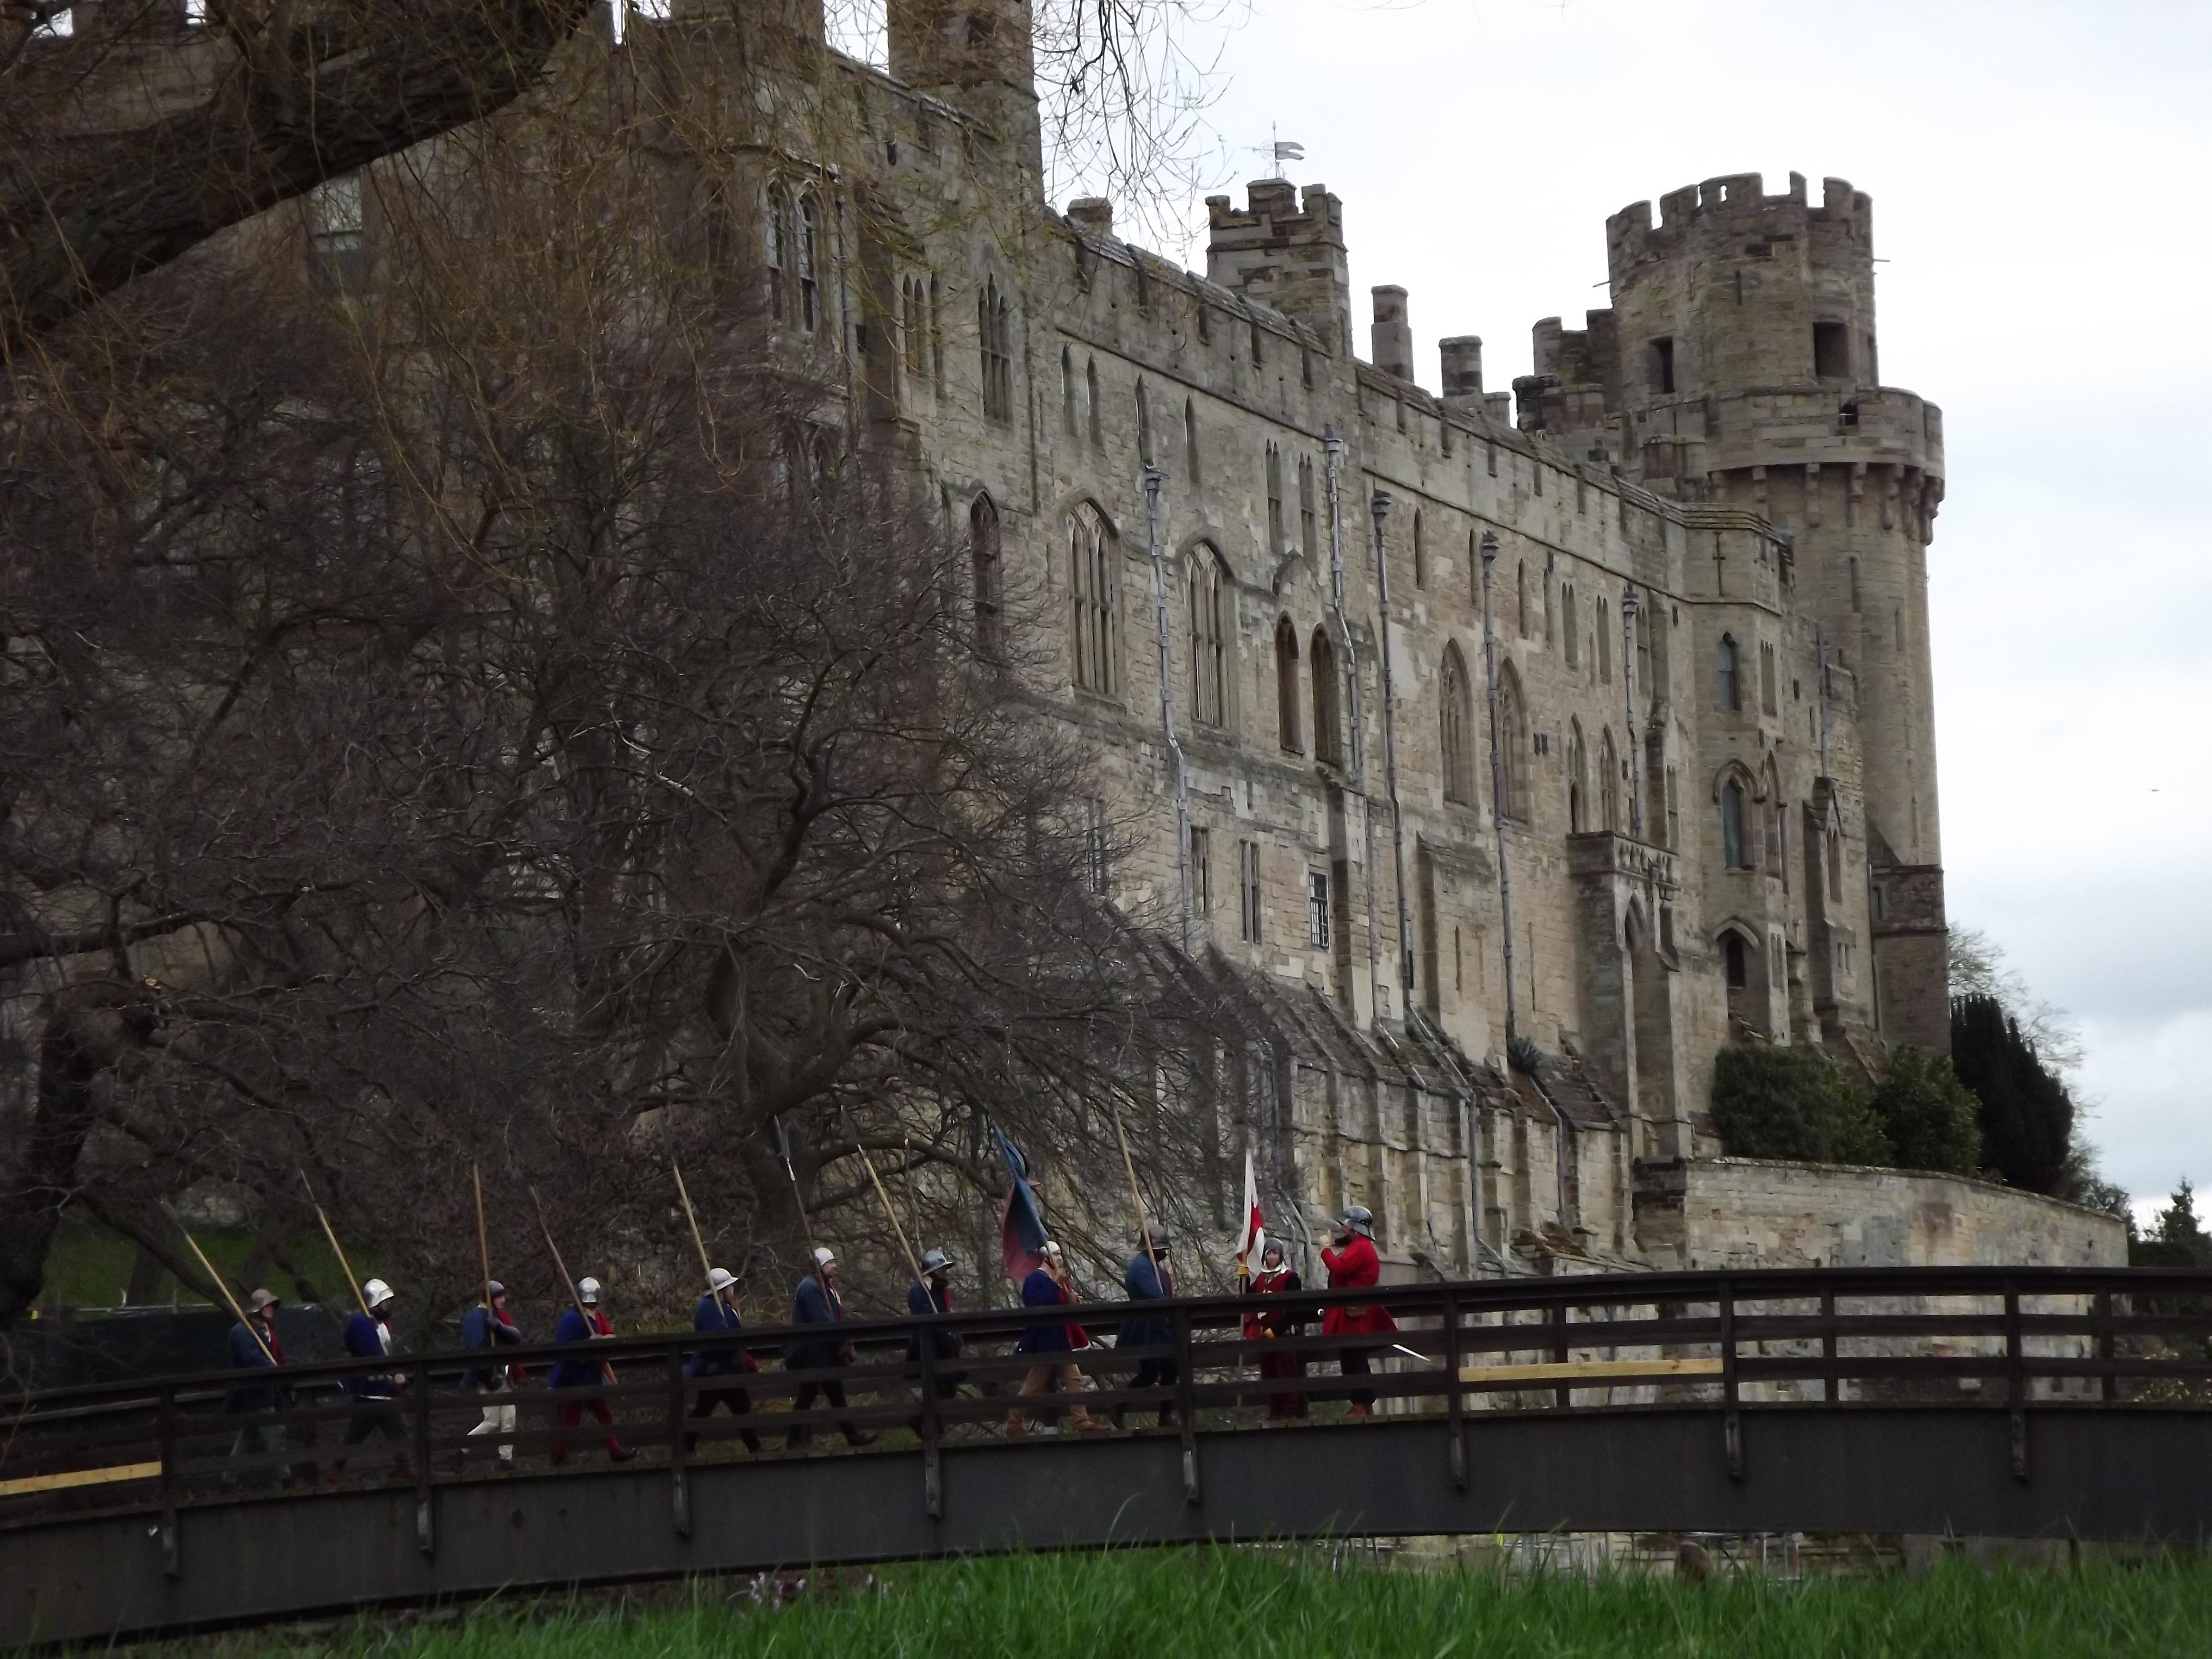 Heading into battle at Warwick Castle